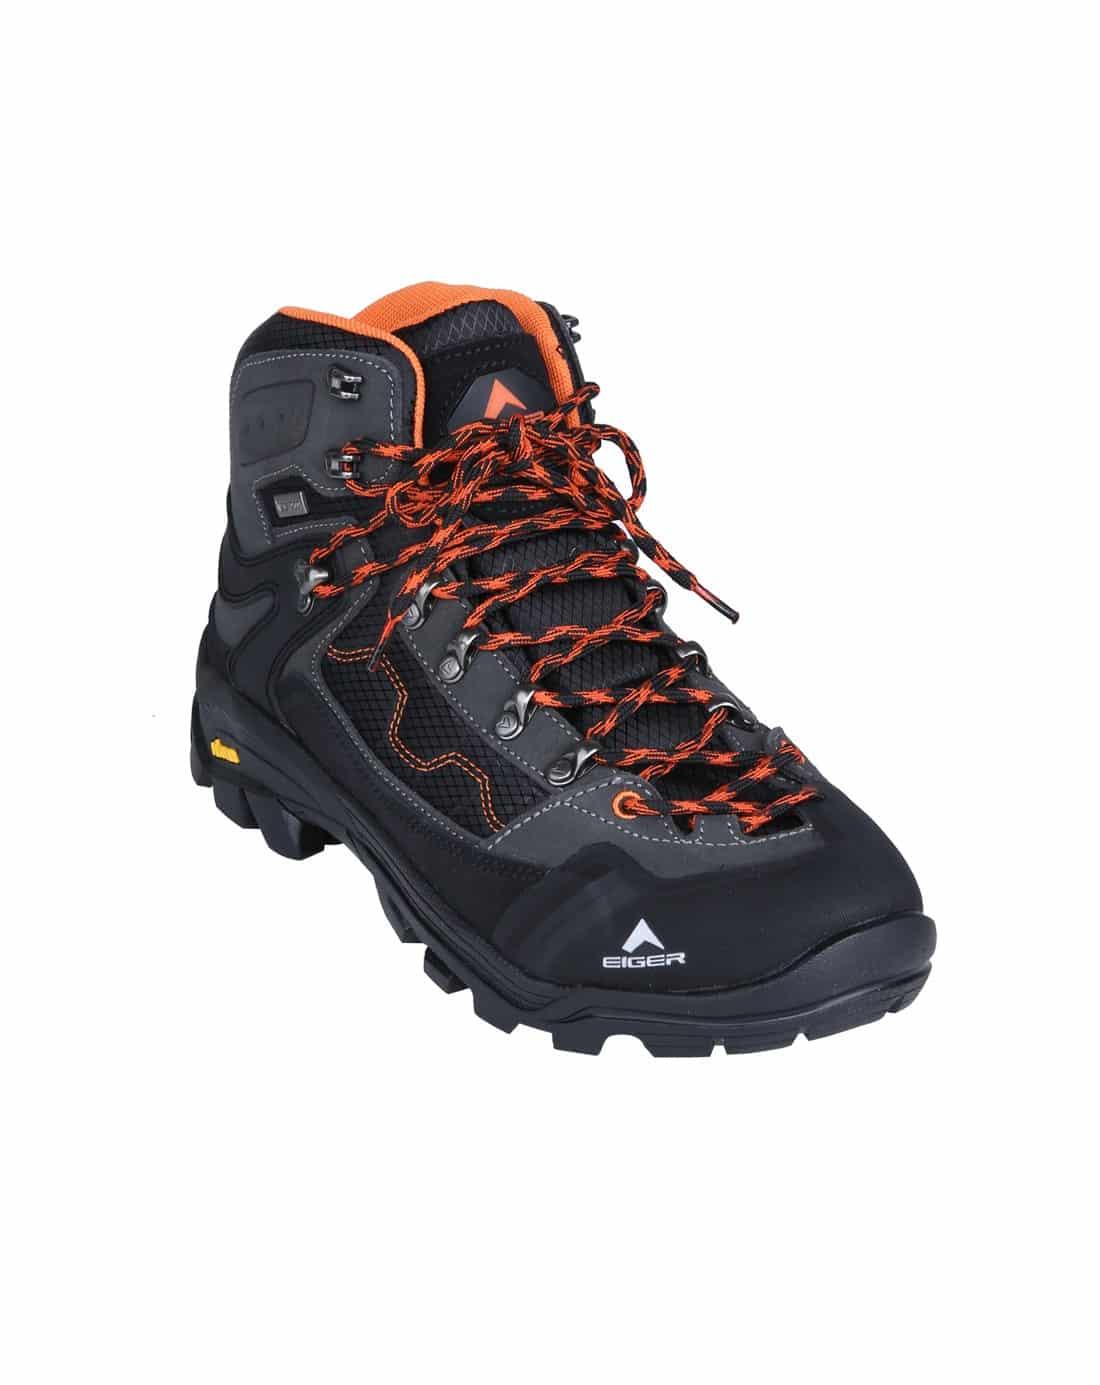 2. Eiger Boots Pollock